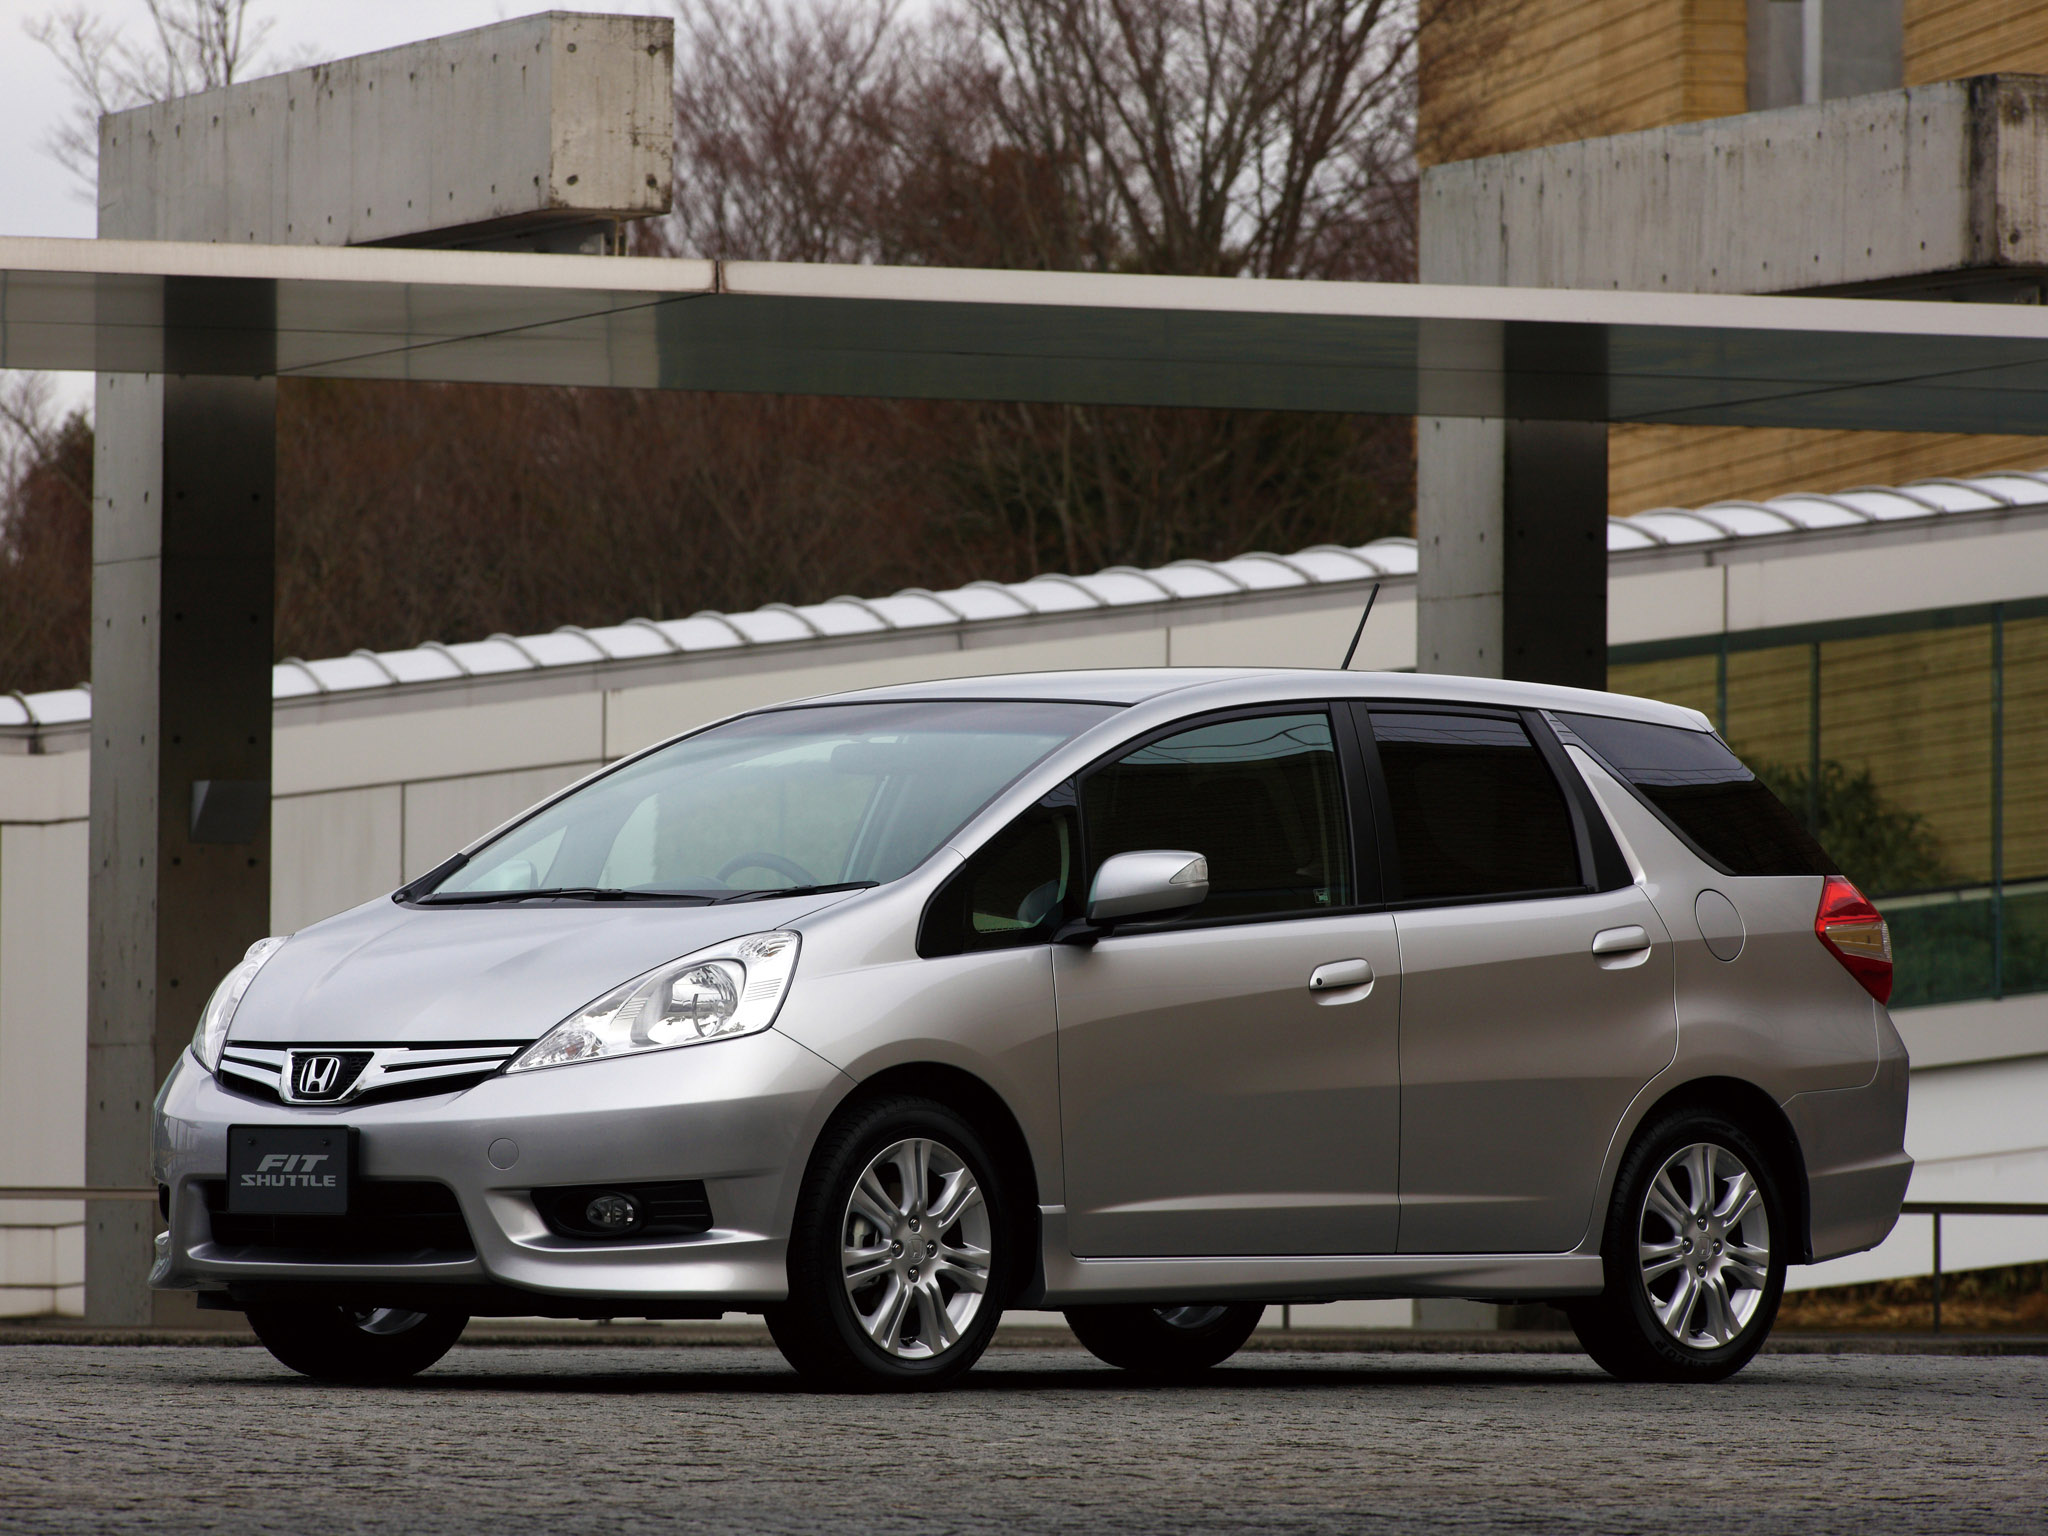 Honda Fit Shuttle Hybrid 2012, GREEN - Autocraft Japan